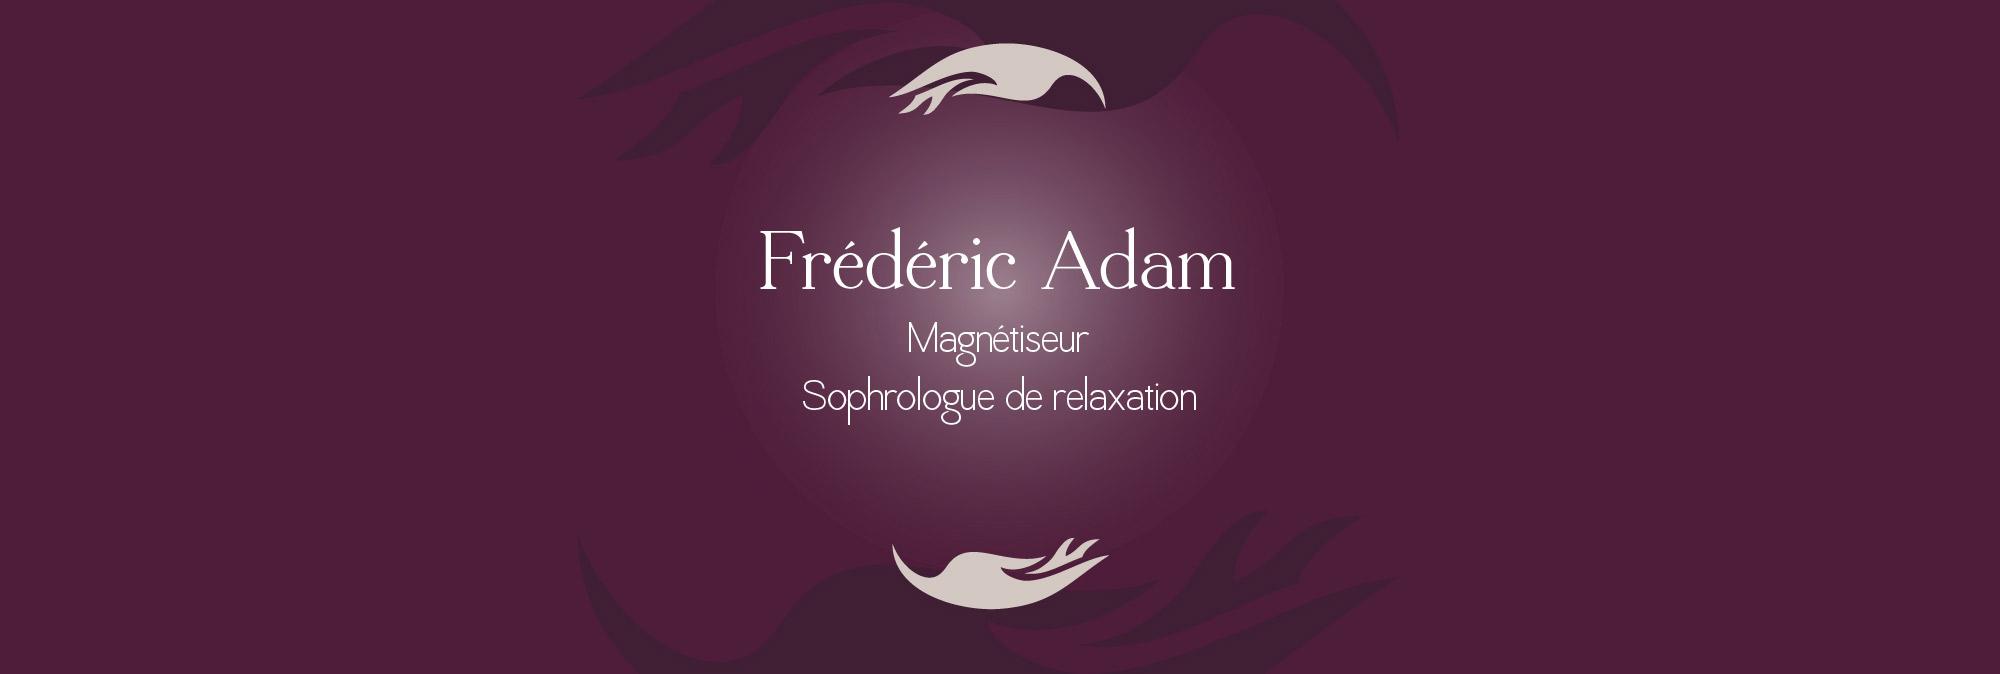 Frederic_Adam_Magnetiseur_Sophrologue_Caen_2